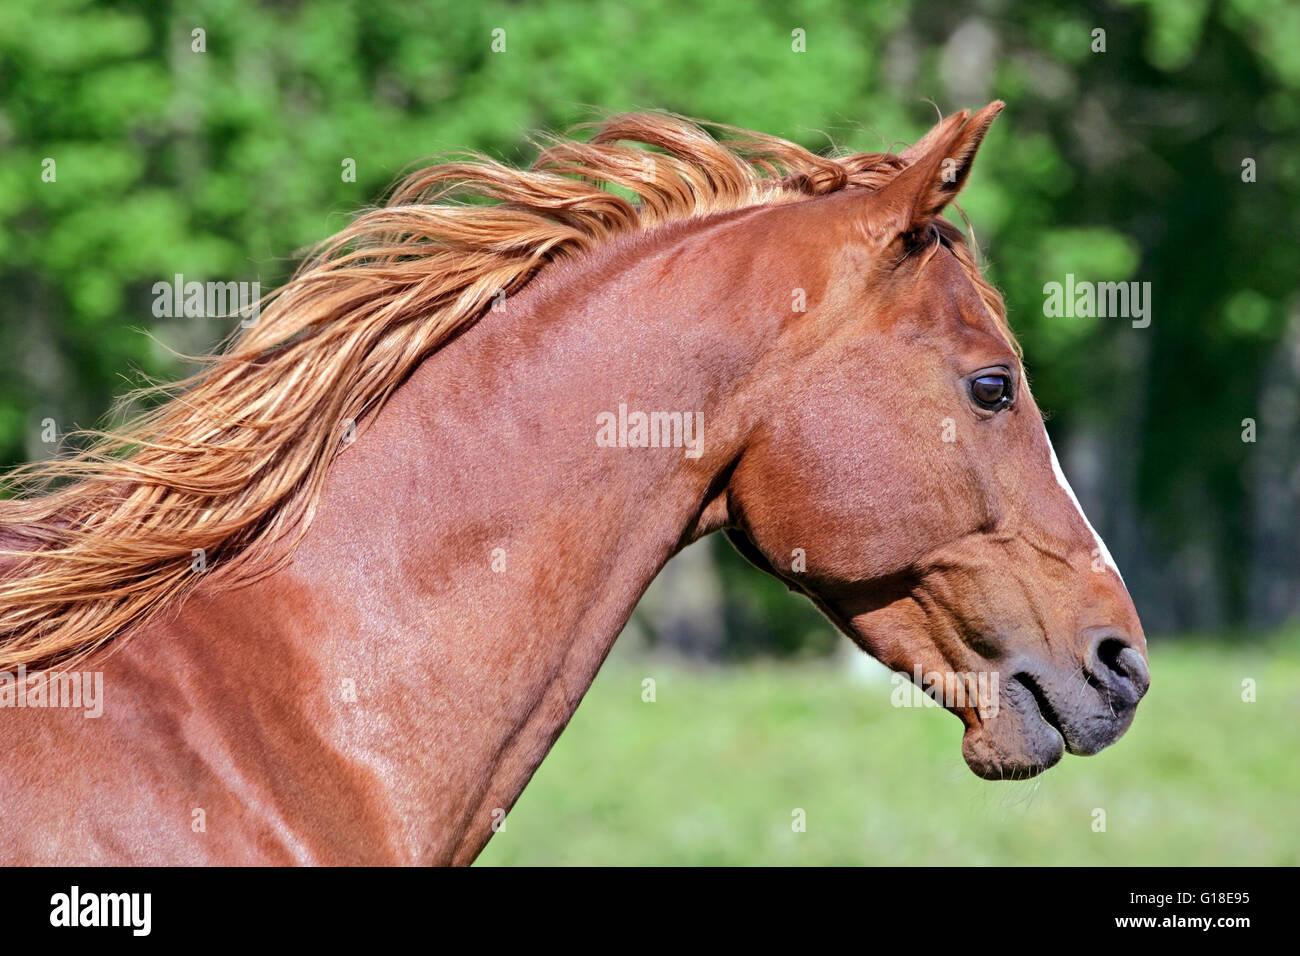 Arabian Horse, chestnut Stallion, portrait Head closeup Stock Photo